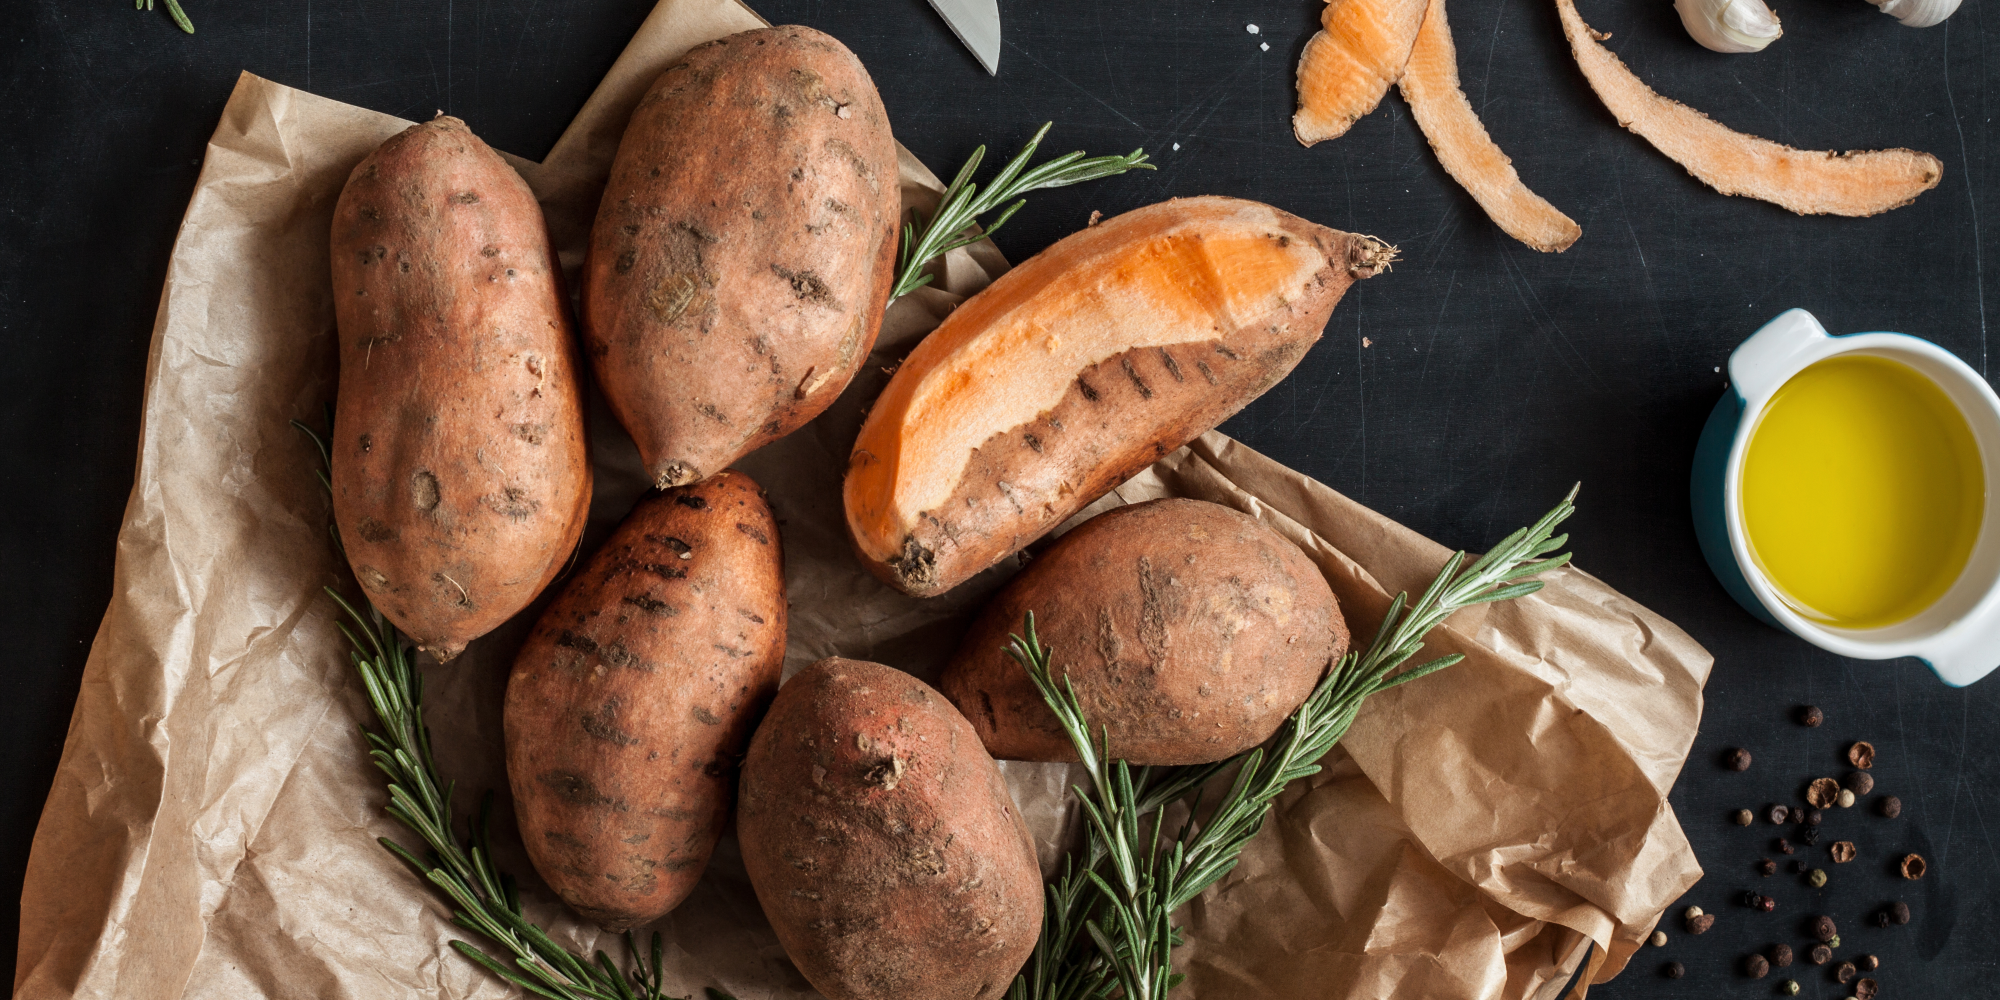 Sweet potatoes boiled